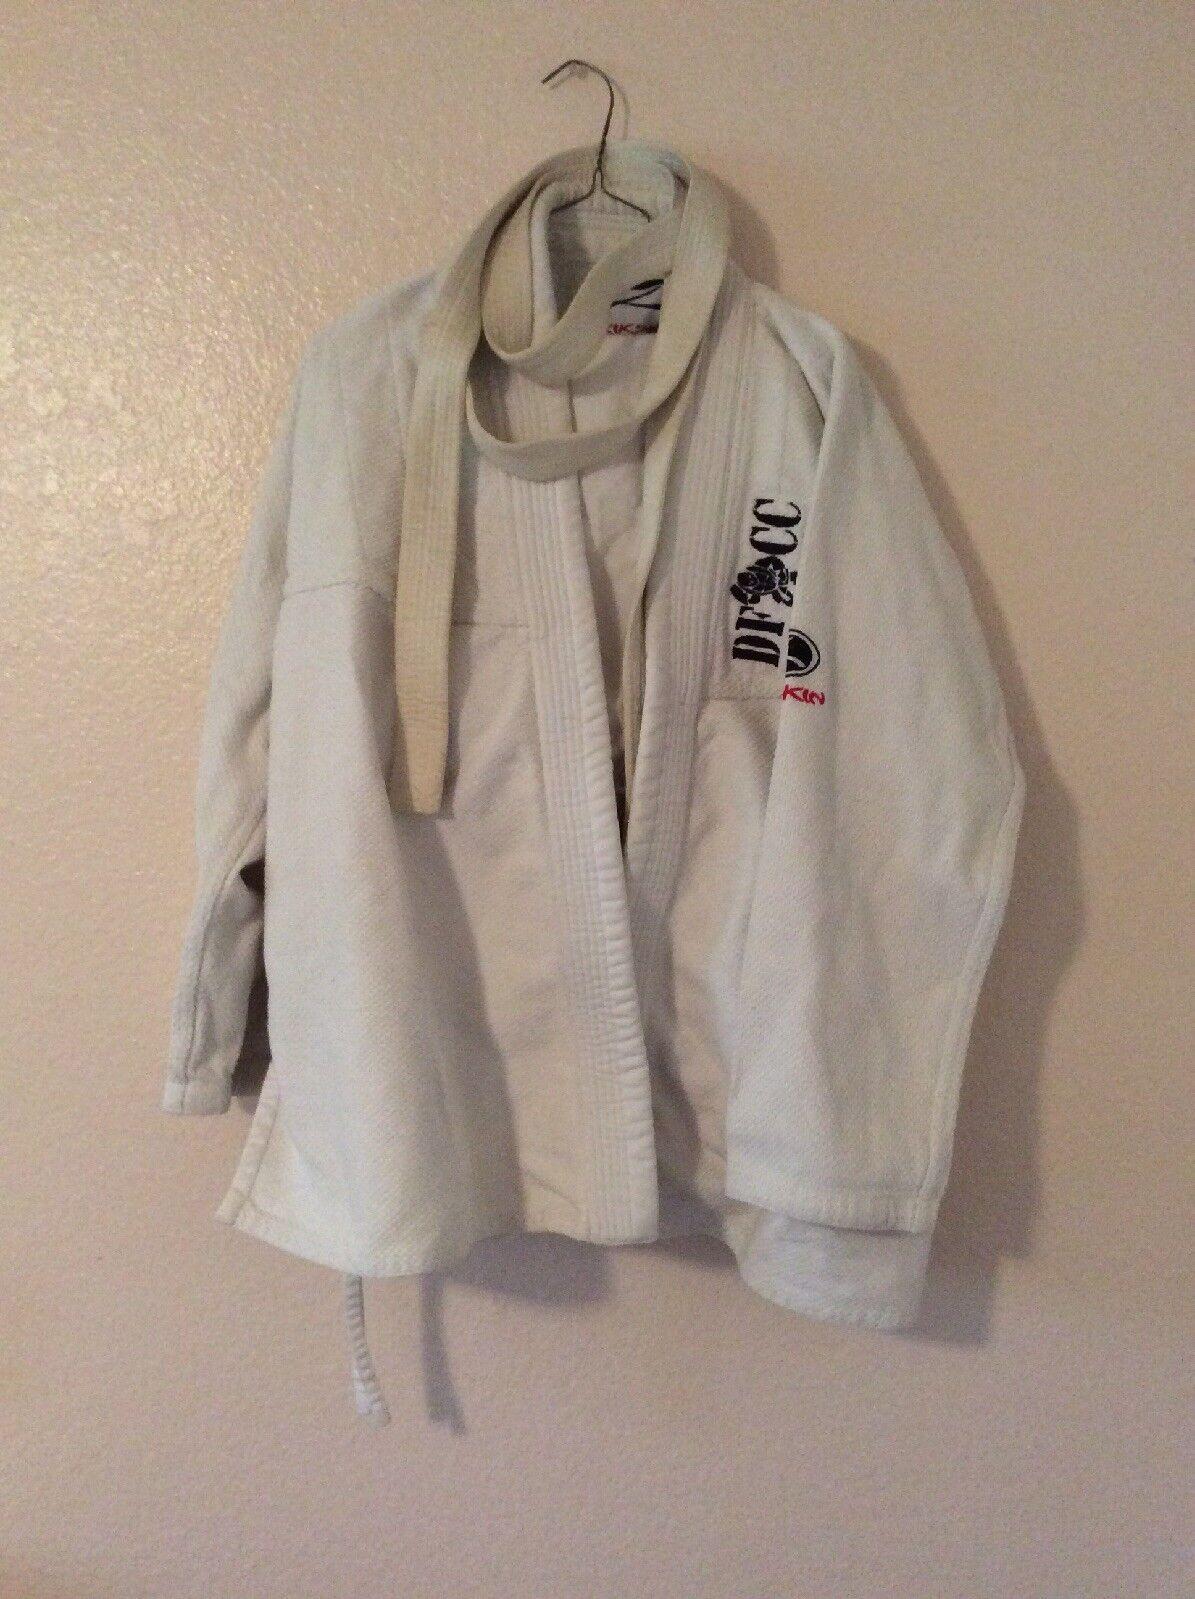 Jim Jitsu Kikskin Karate Uniform (Gi) size 5-3A Used